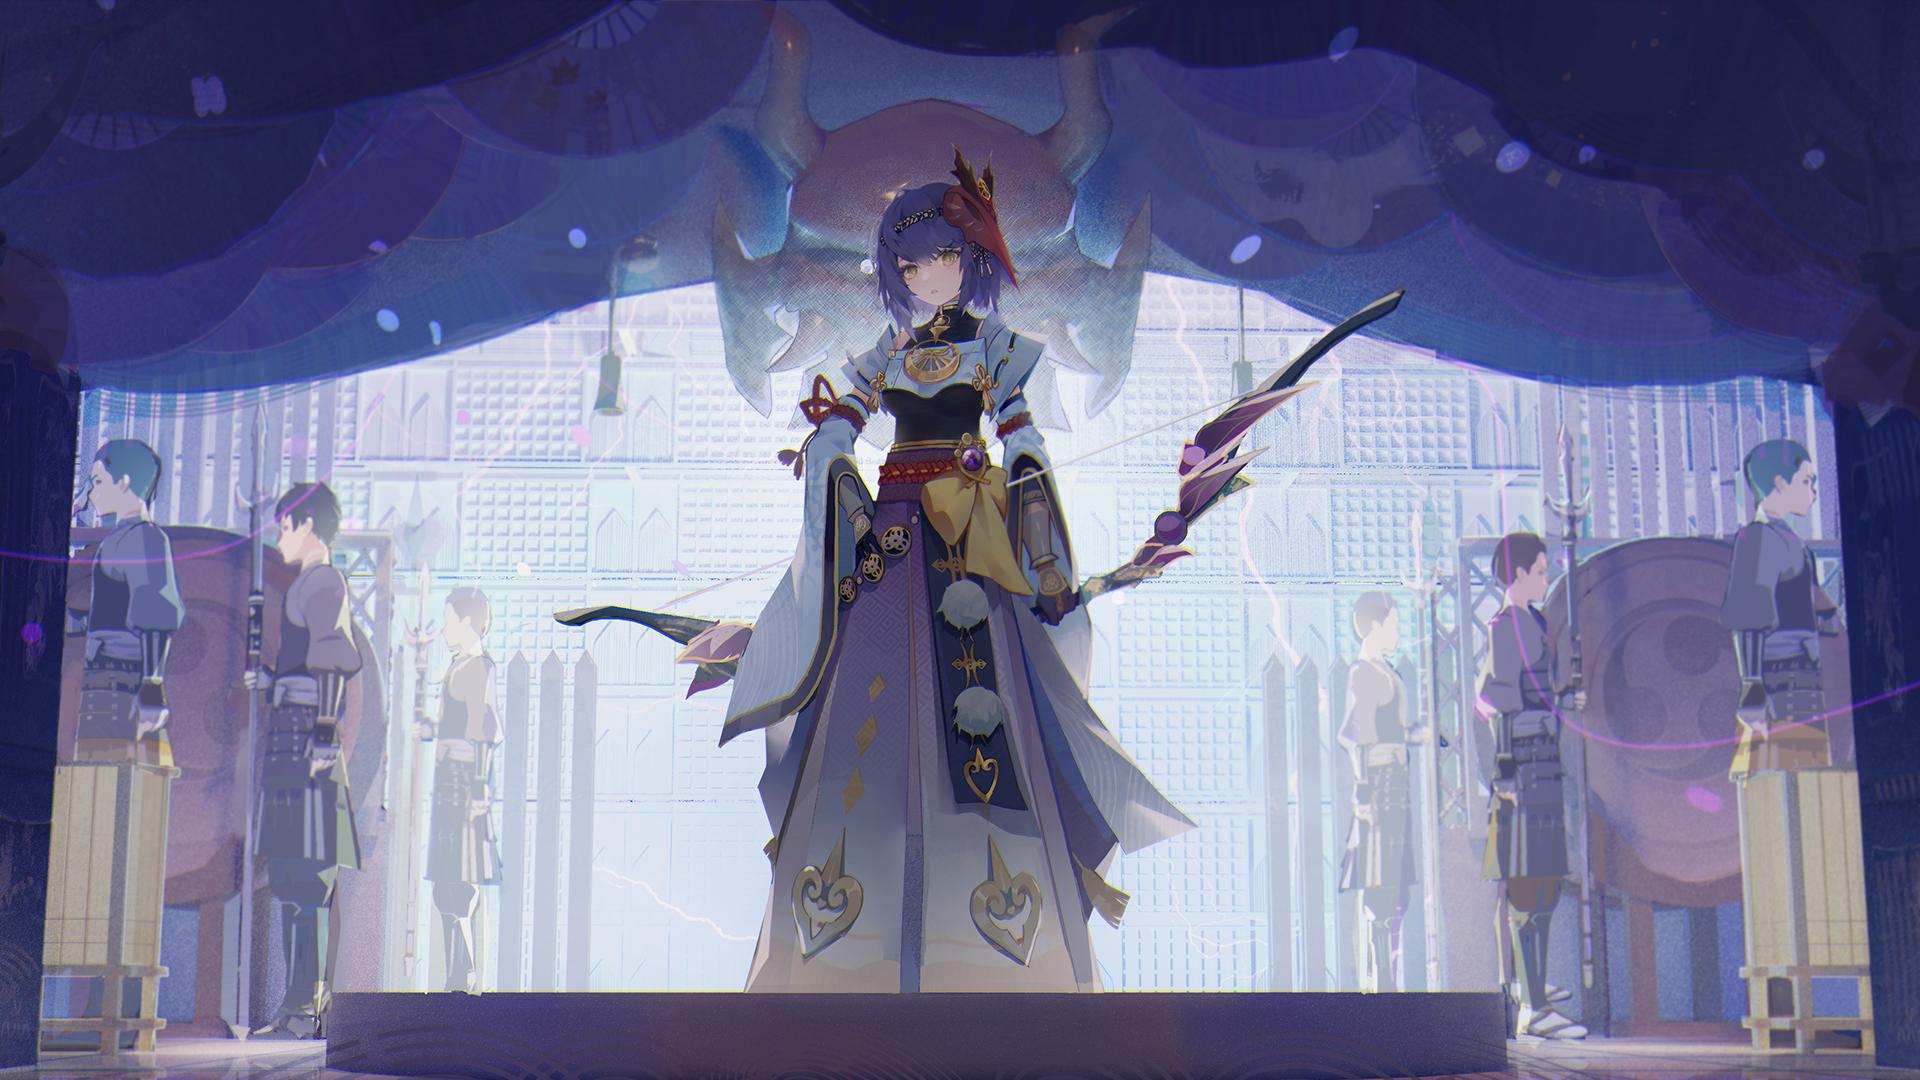 Genshin Impact Anime Girls Video Games Bow Weapon Dress Sara Kujou Mask 1920x1080